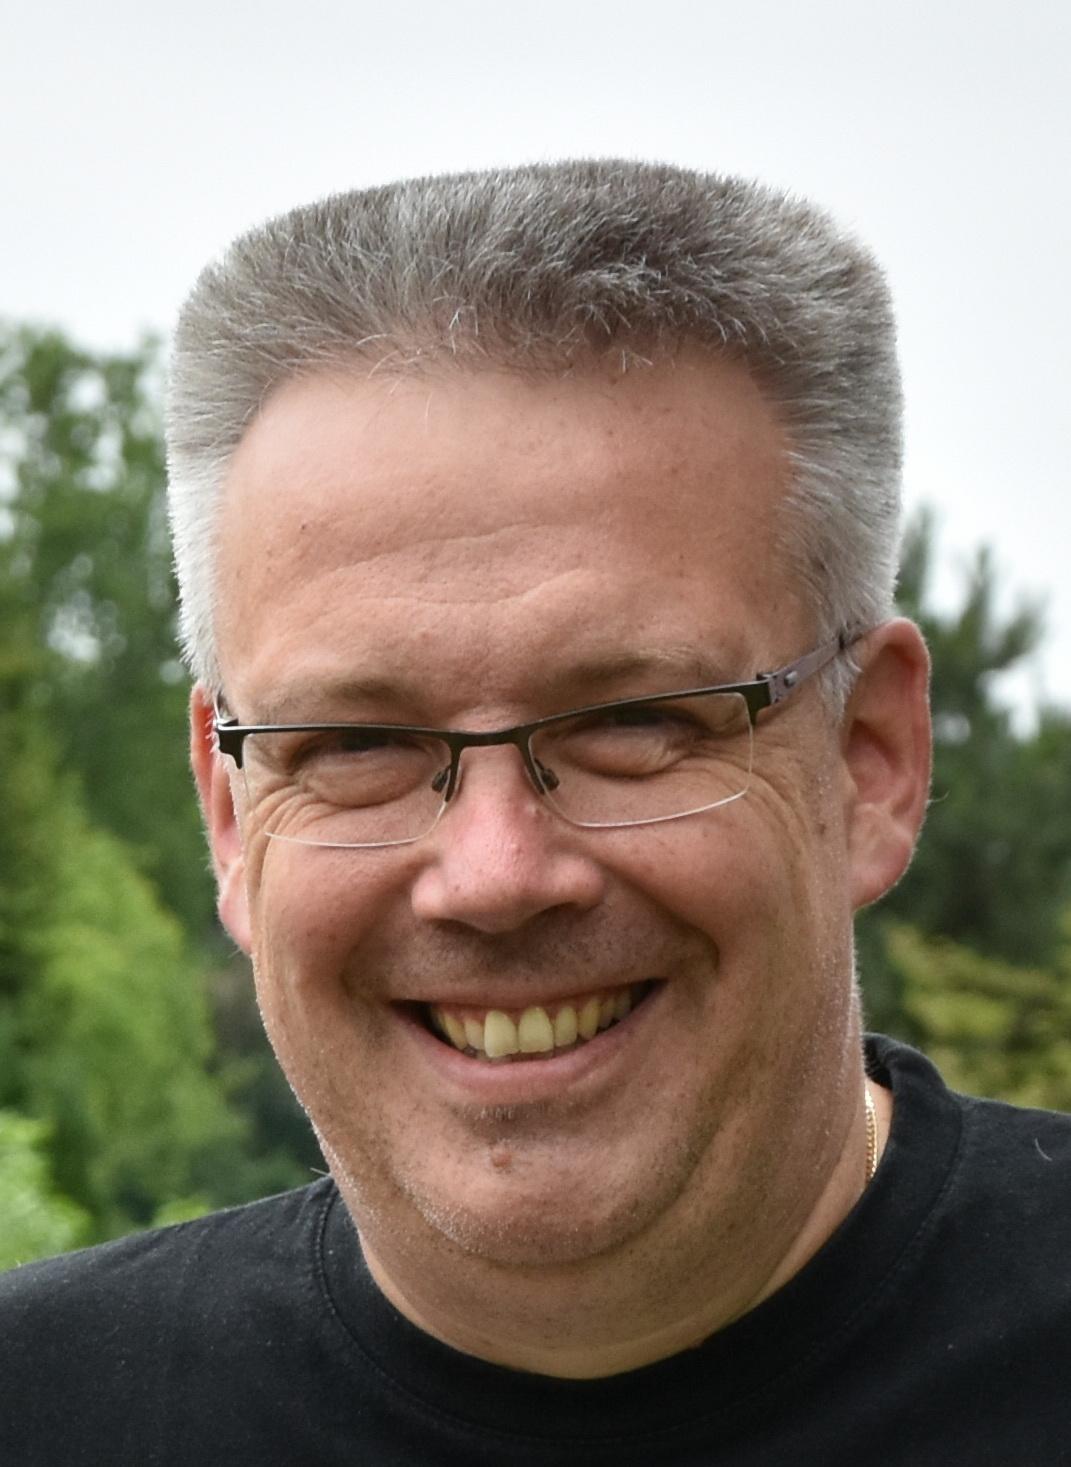 Jörg Fabricius